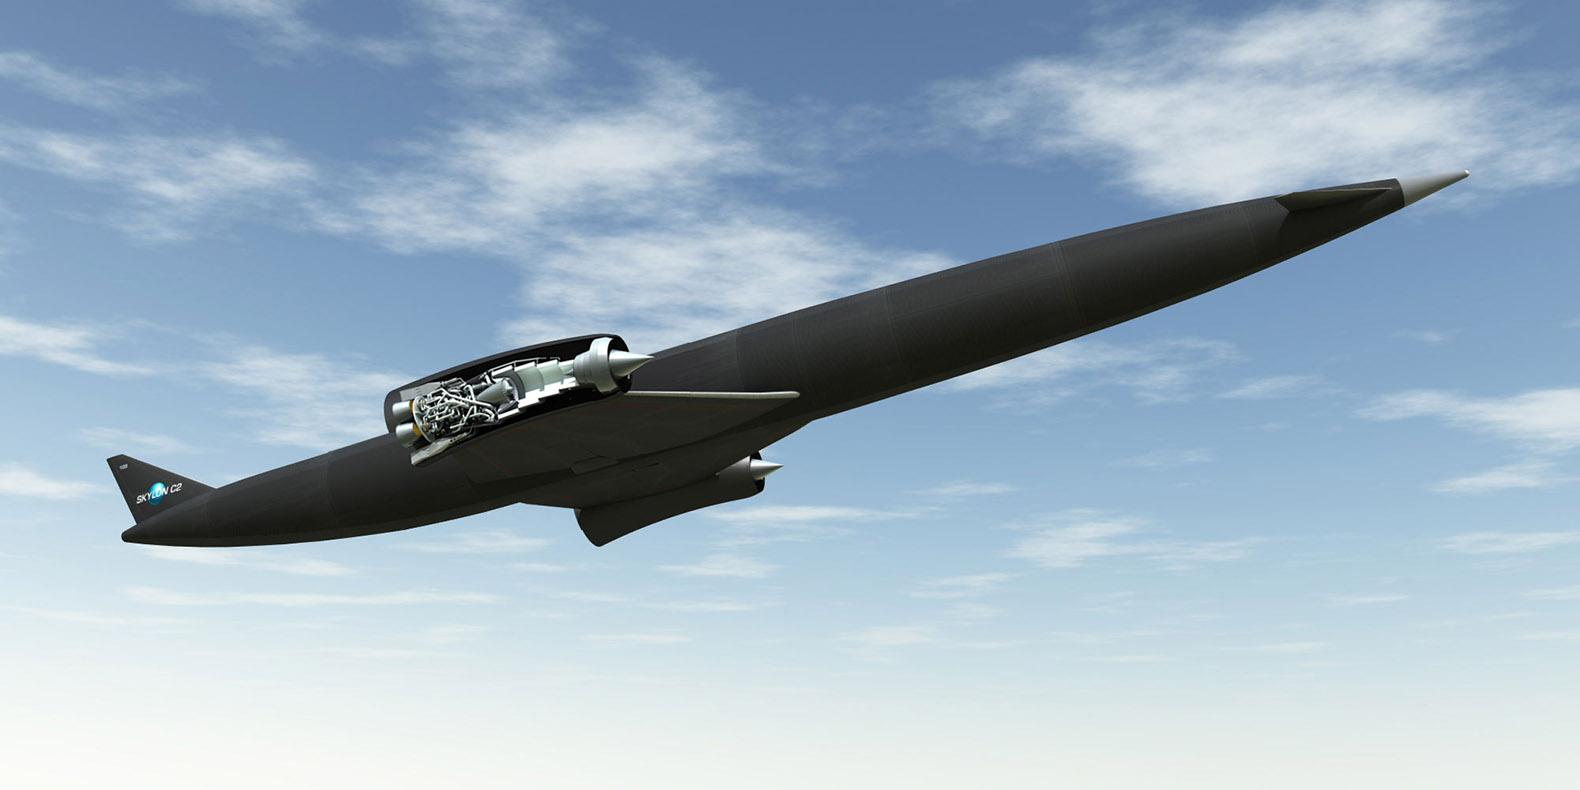 An artist's impression of Skylon, a space plane that could utilize a SABRE engine.